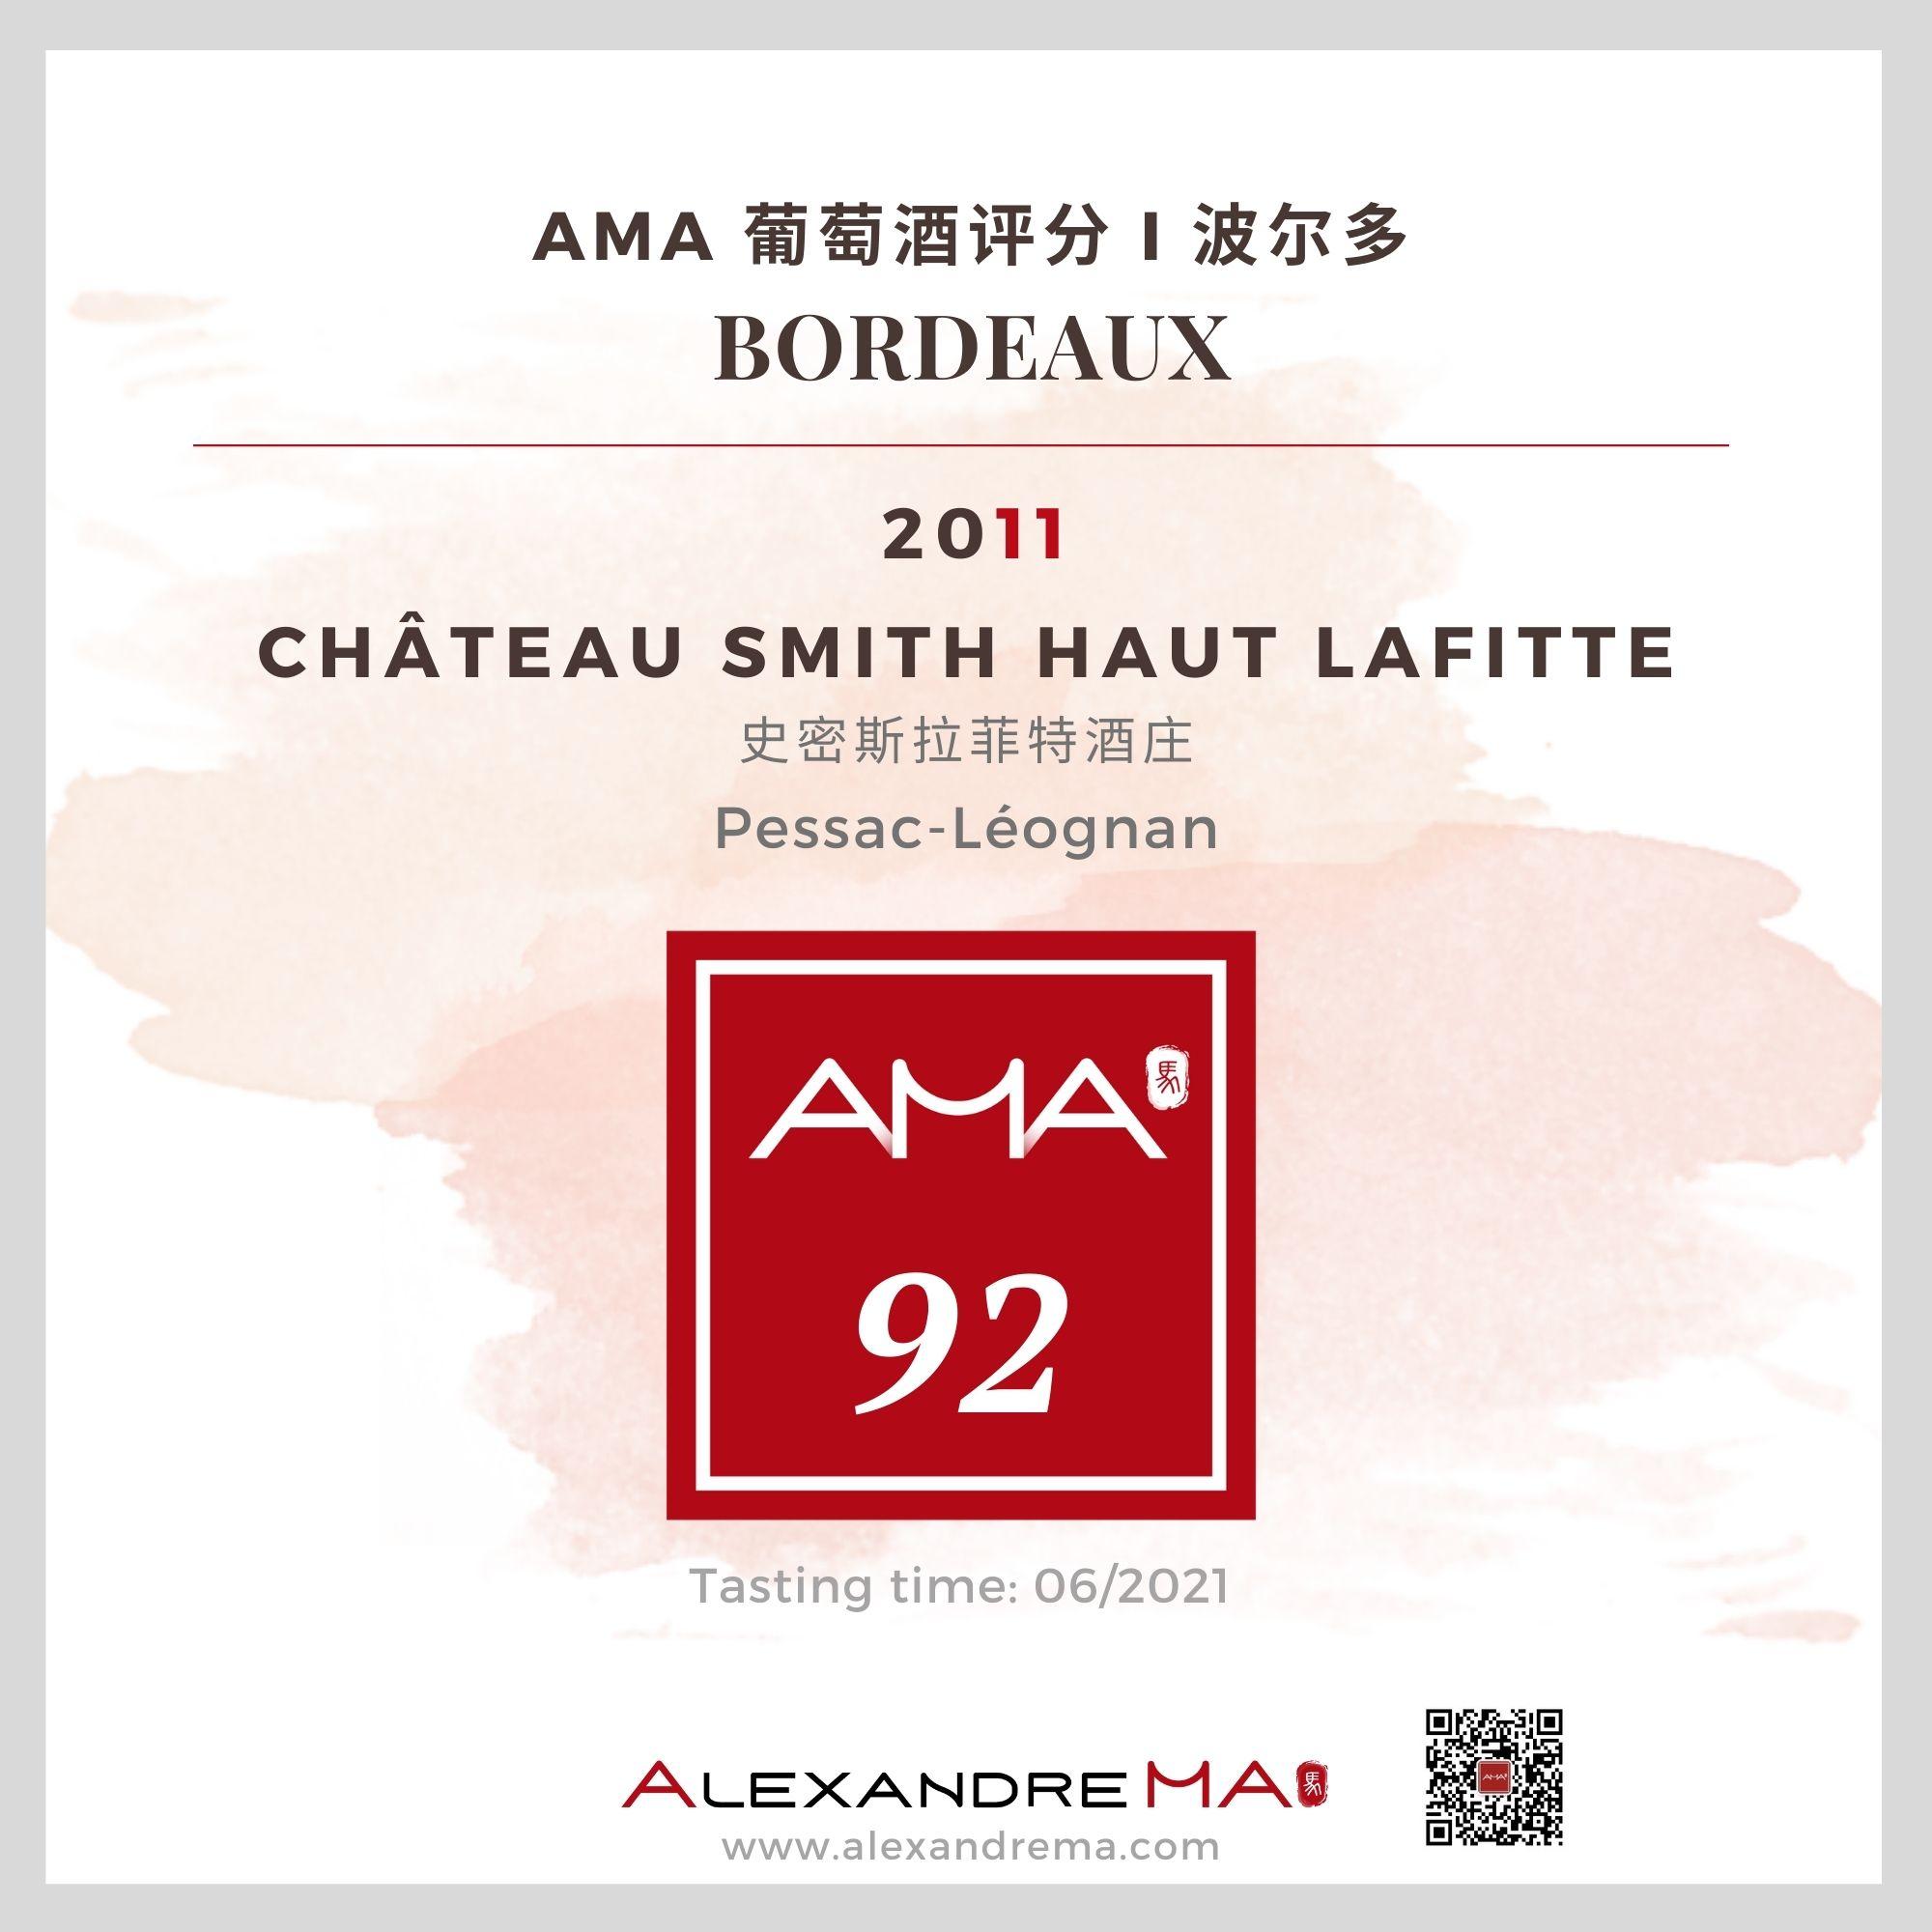 Château Smith Haut Lafitte 2011 - Alexandre MA